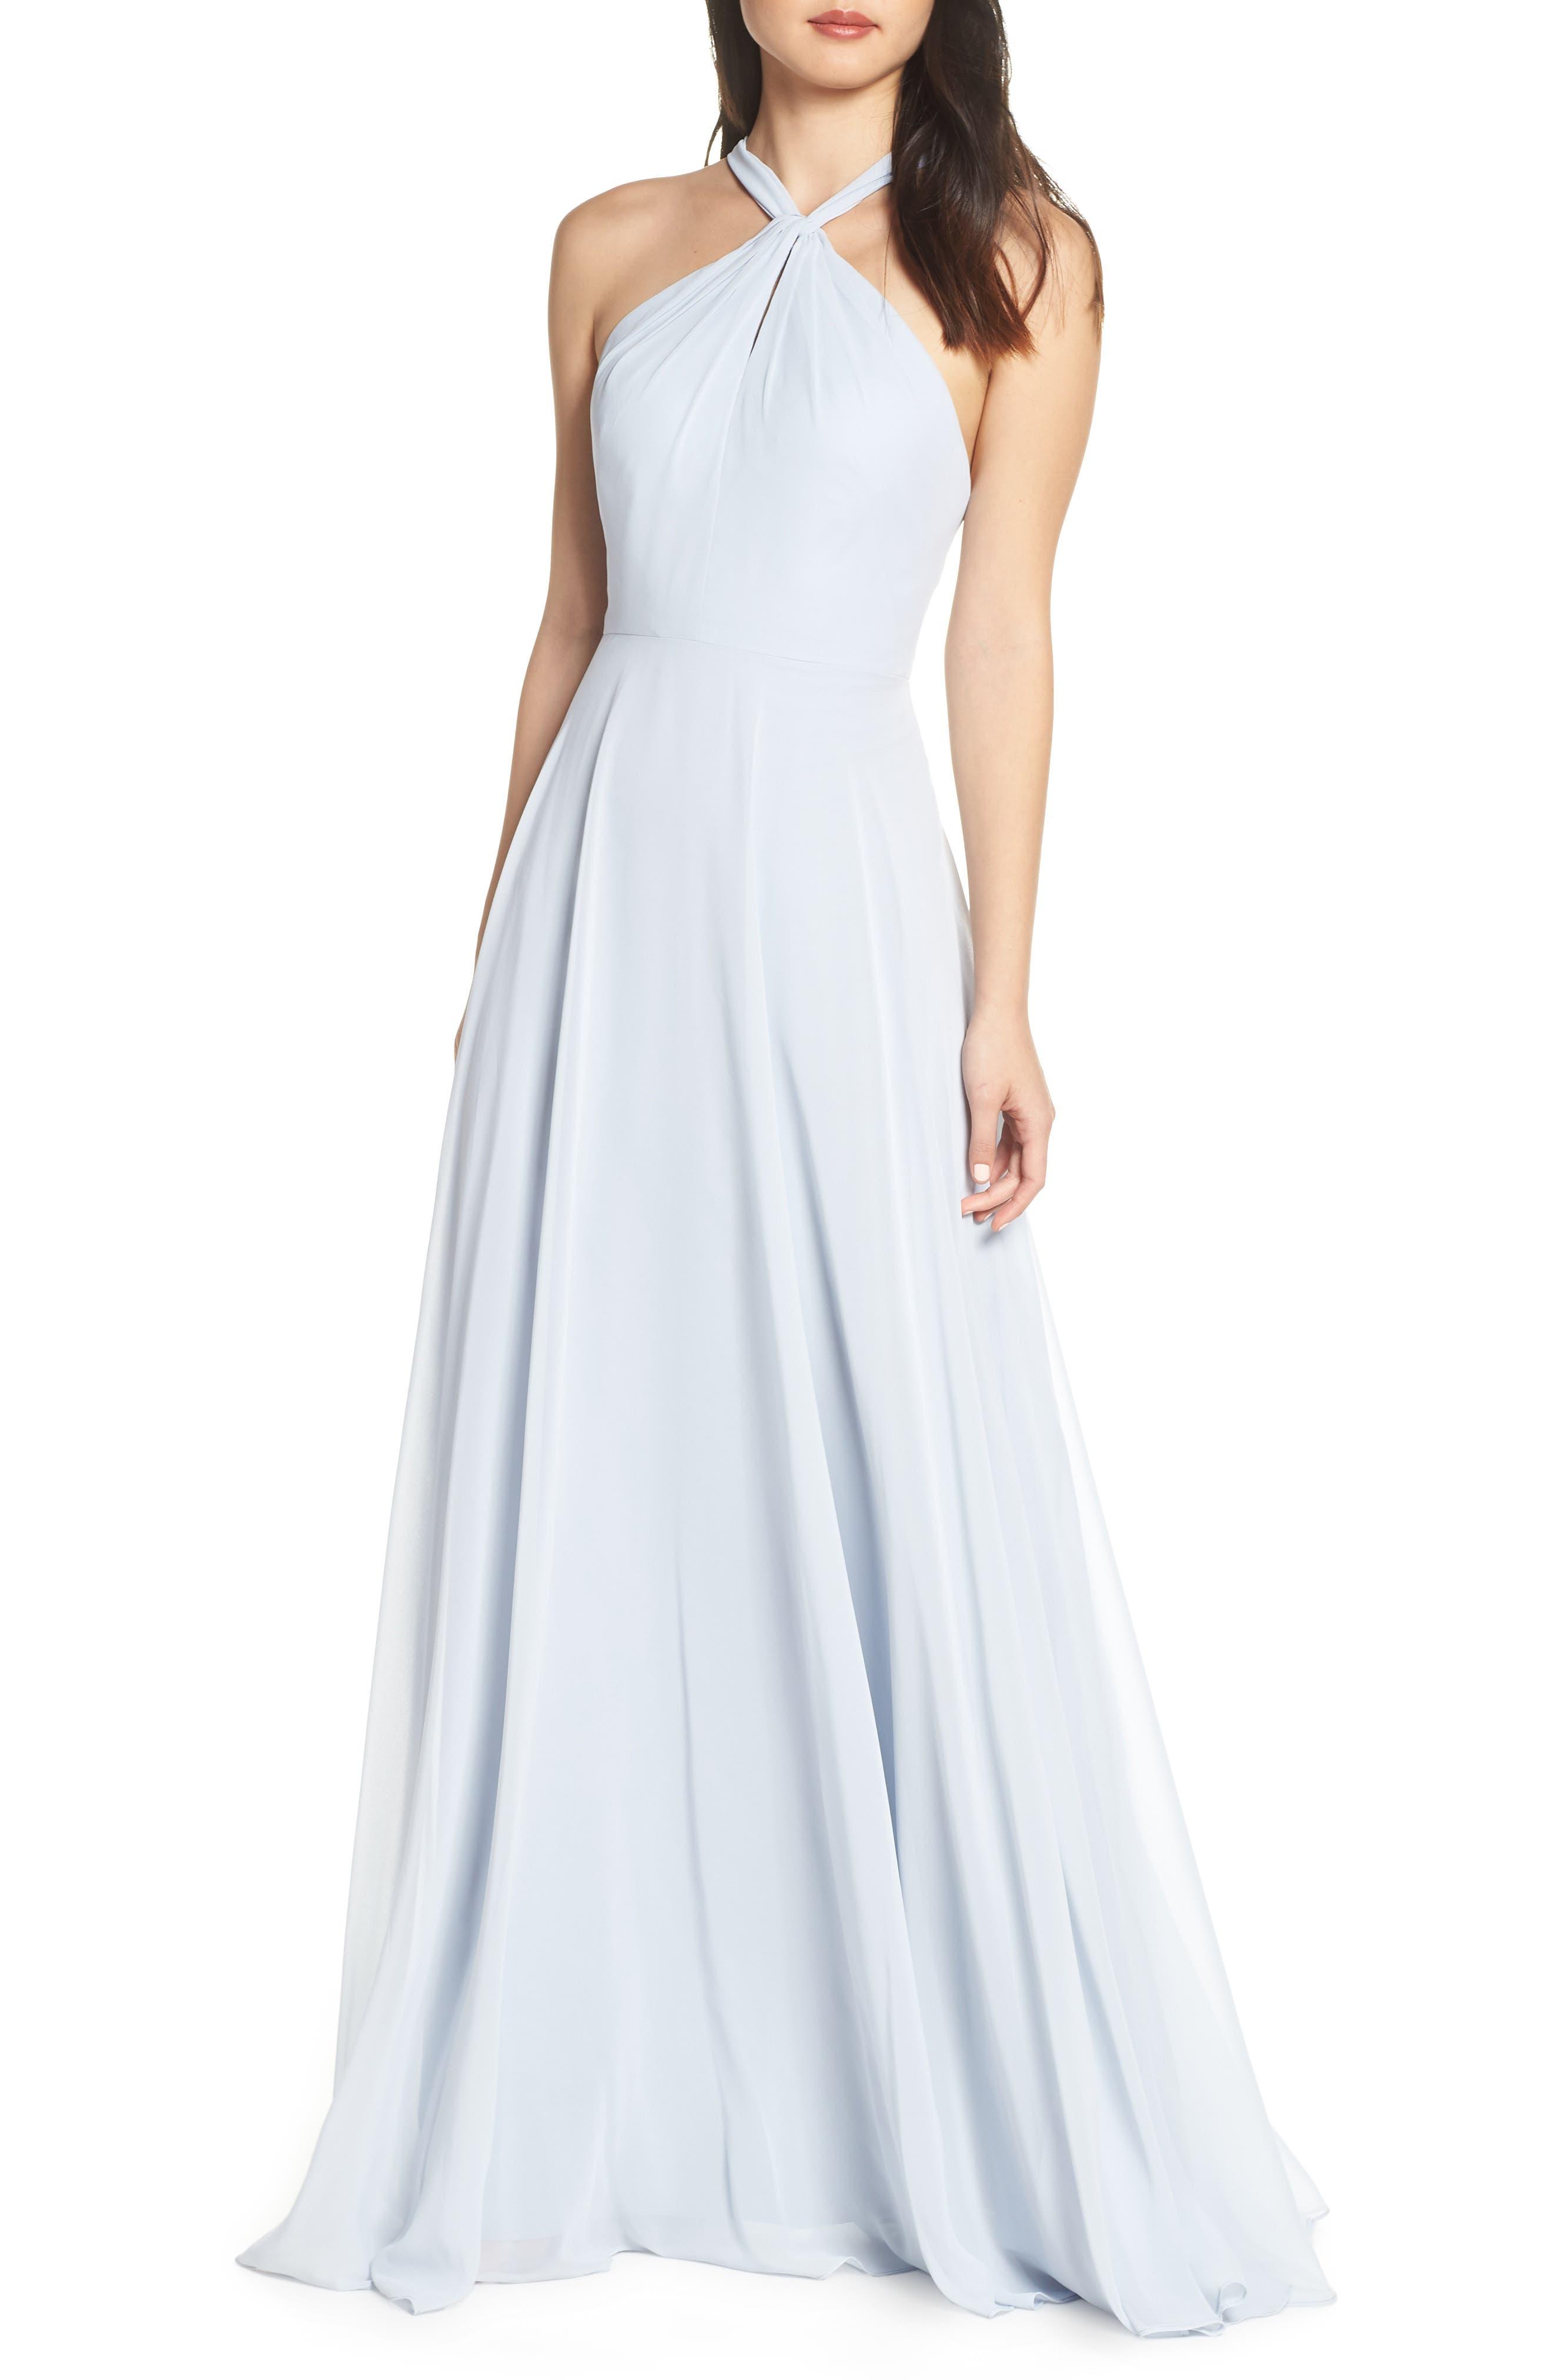 Jenny Yoo Halle Halter Evening Dress, 8 (similar to 1) - Blue